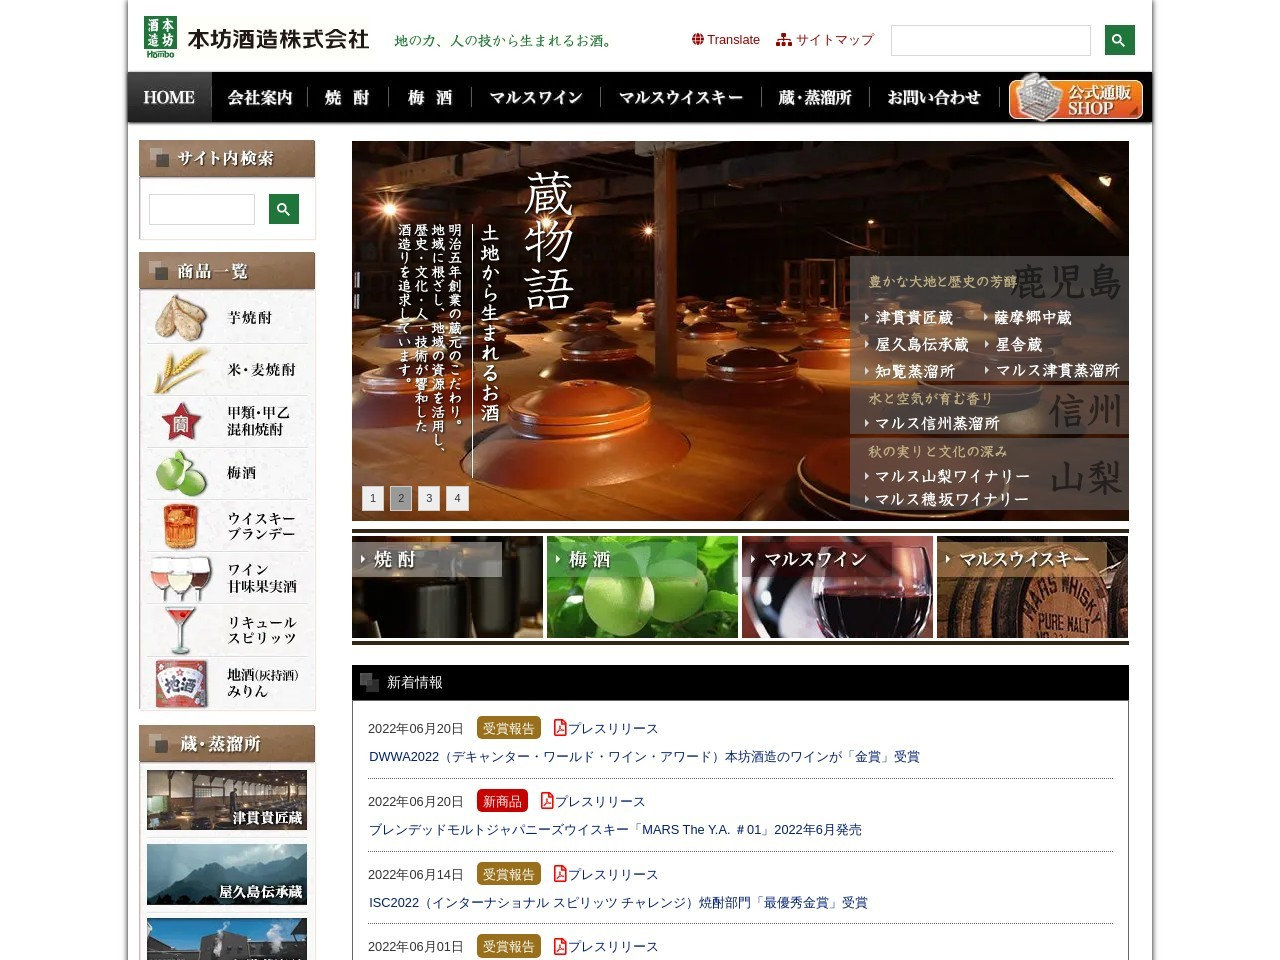 本坊酒造株式会社 公式サイト